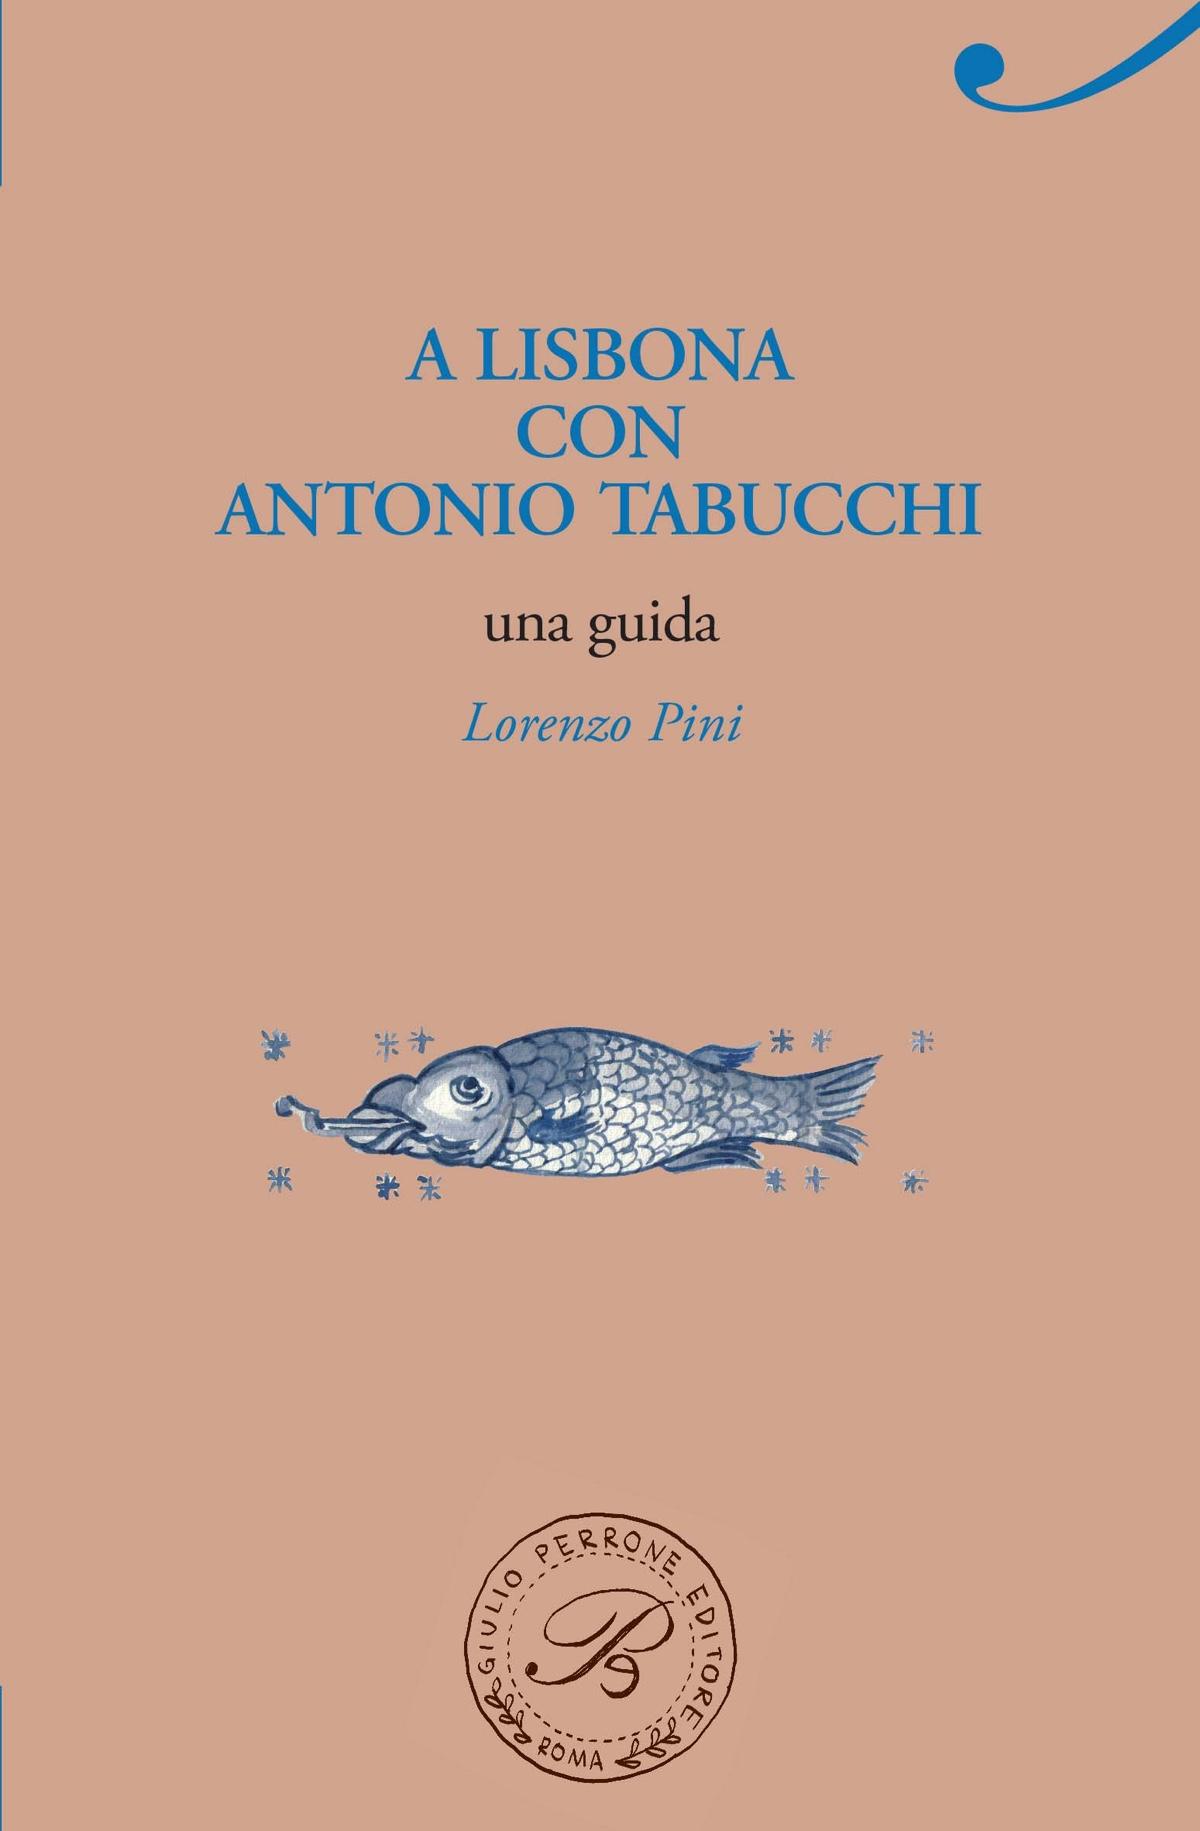 A Lisbona con Antonio Tabucchi